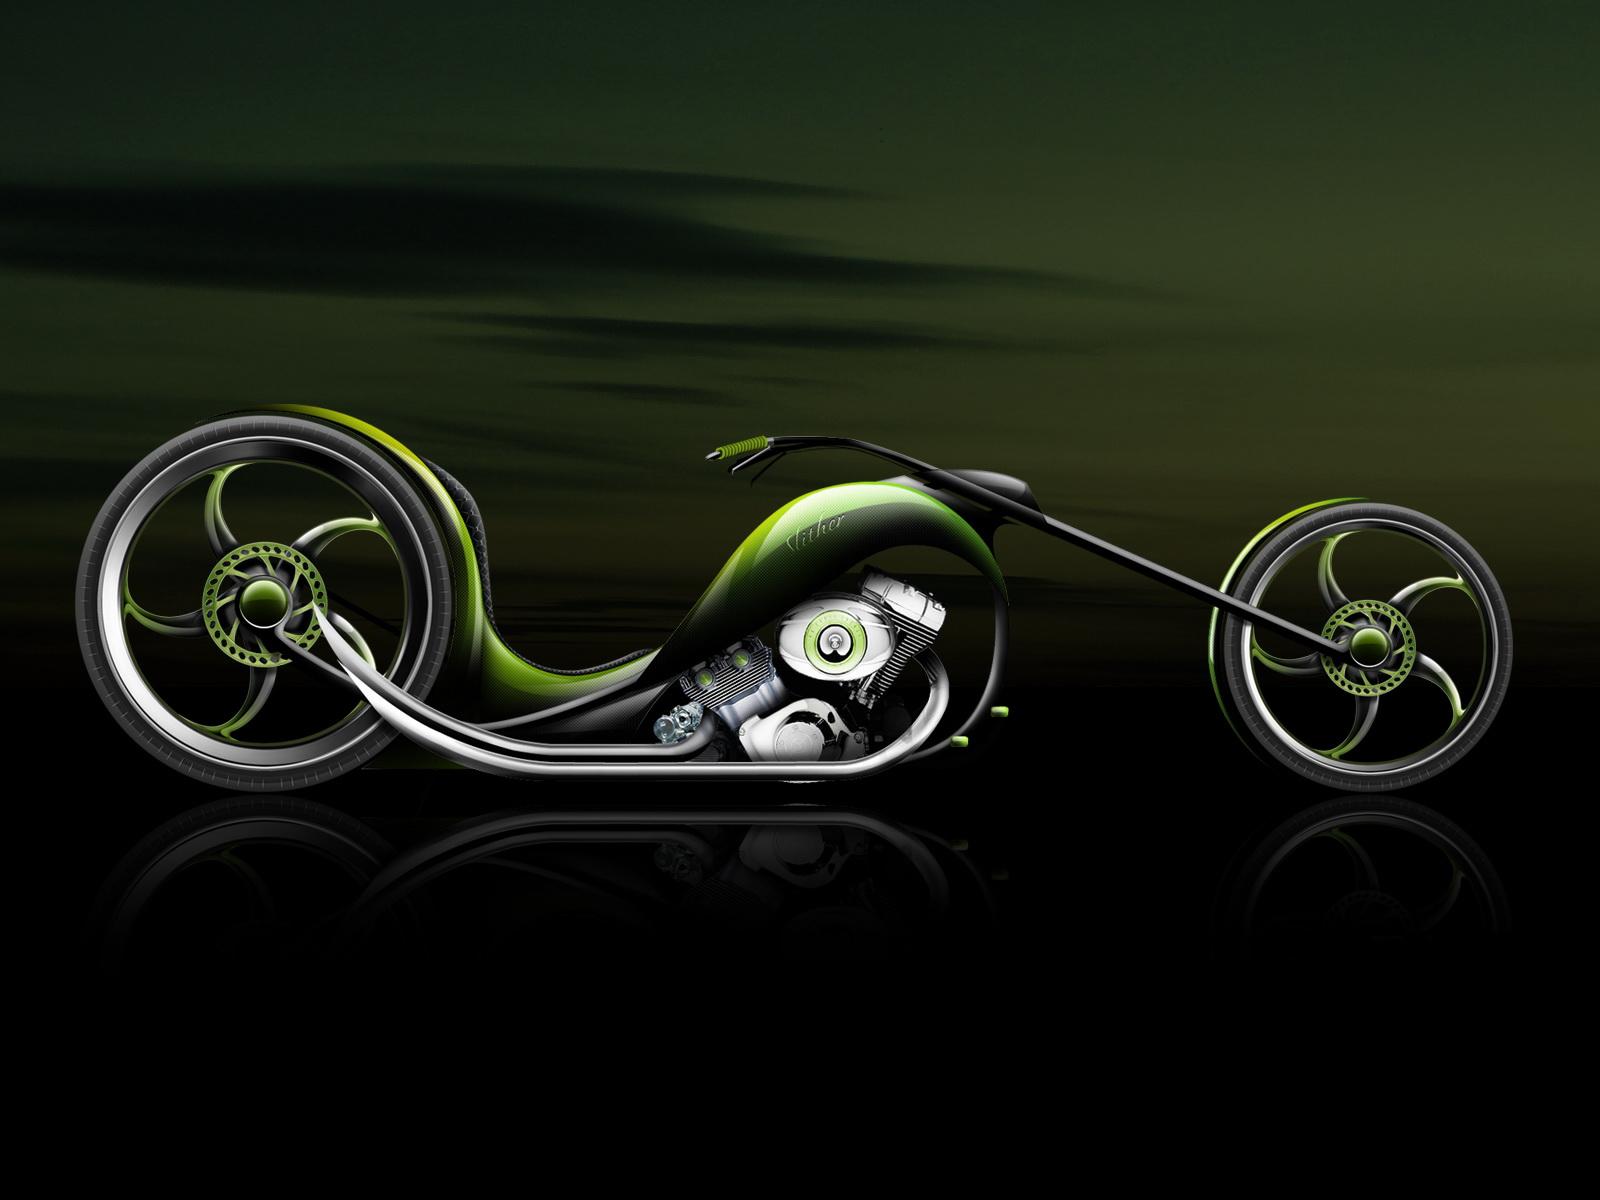 35 HD Bike Wallpapers for Desktop Download 1600x1200